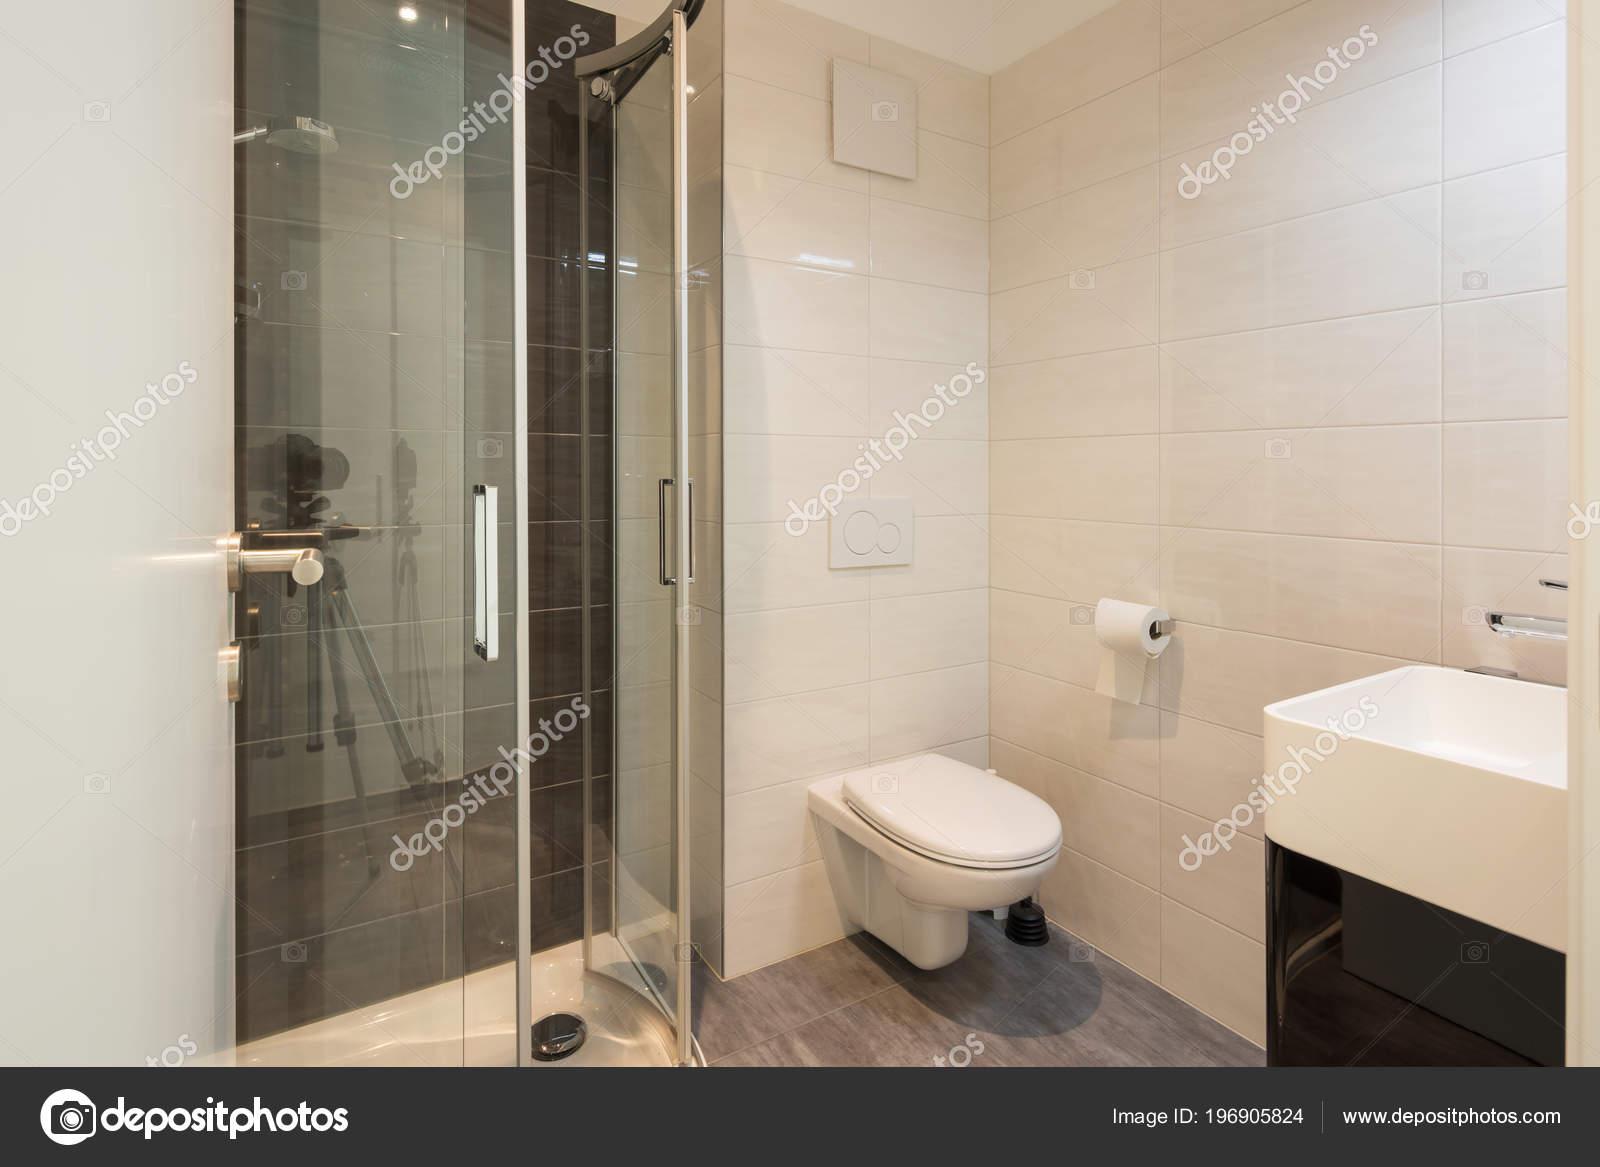 Grote Tegels Badkamer : Minimalistische moderne badkamer met grote tegels niemand binnen